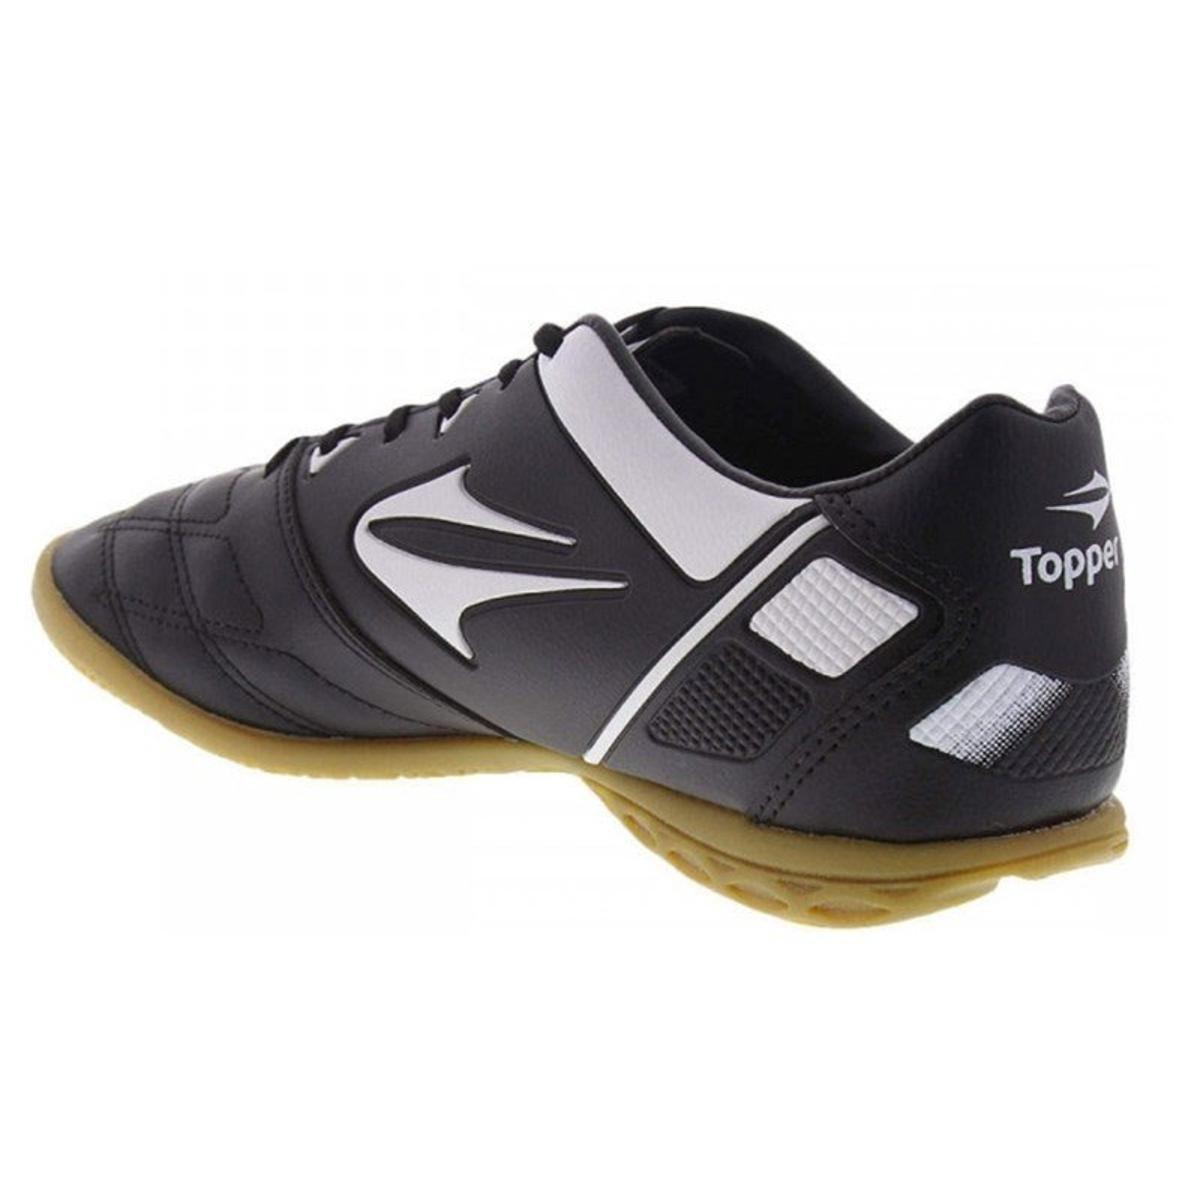 35a00d8a4c Chuteira Futsal Topper Champion 5 4136534 - Compre Agora